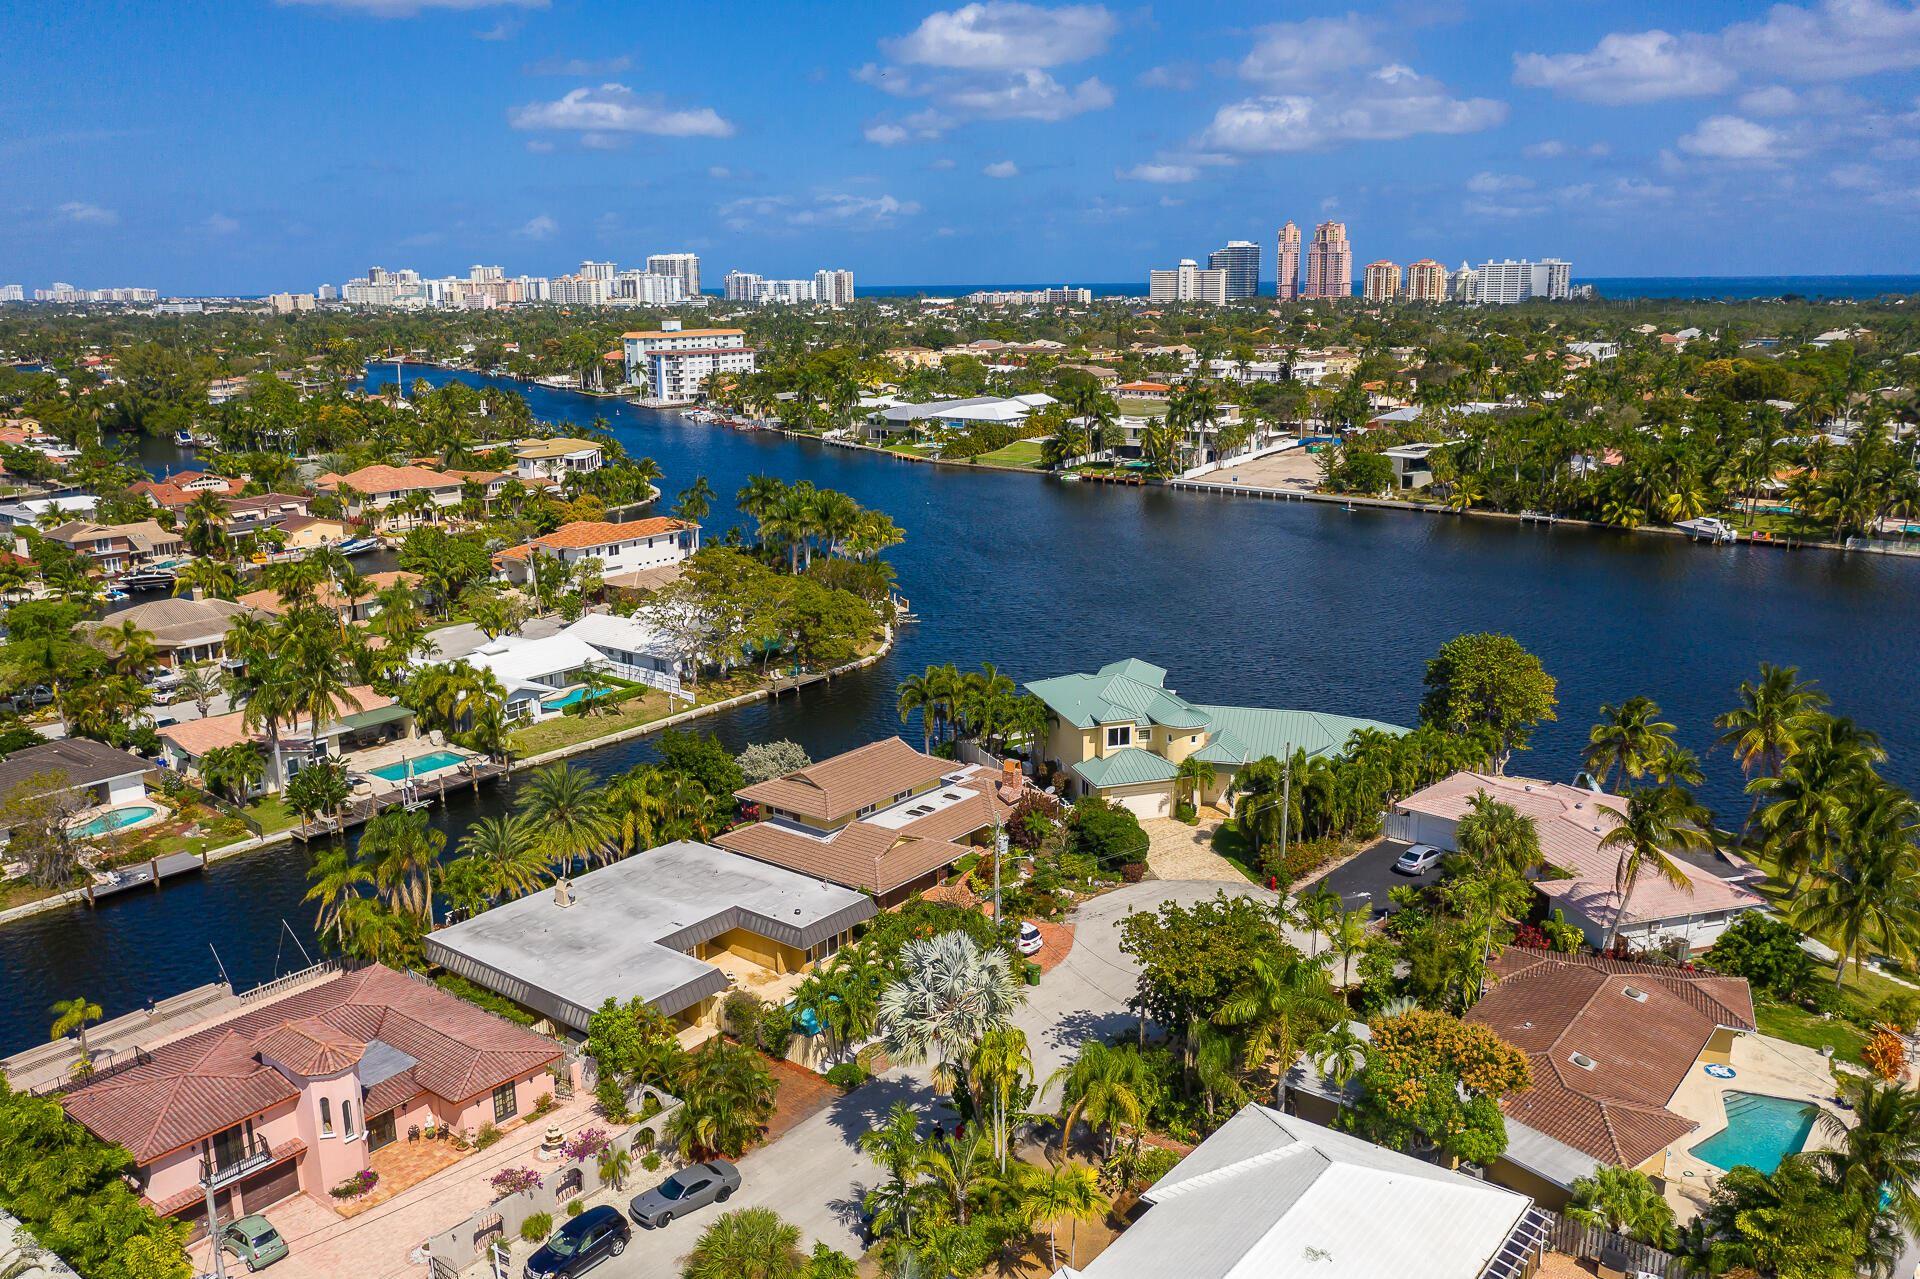 Photo of 2213 NE 16th Street, Fort Lauderdale, FL 33305 (MLS # RX-10754841)